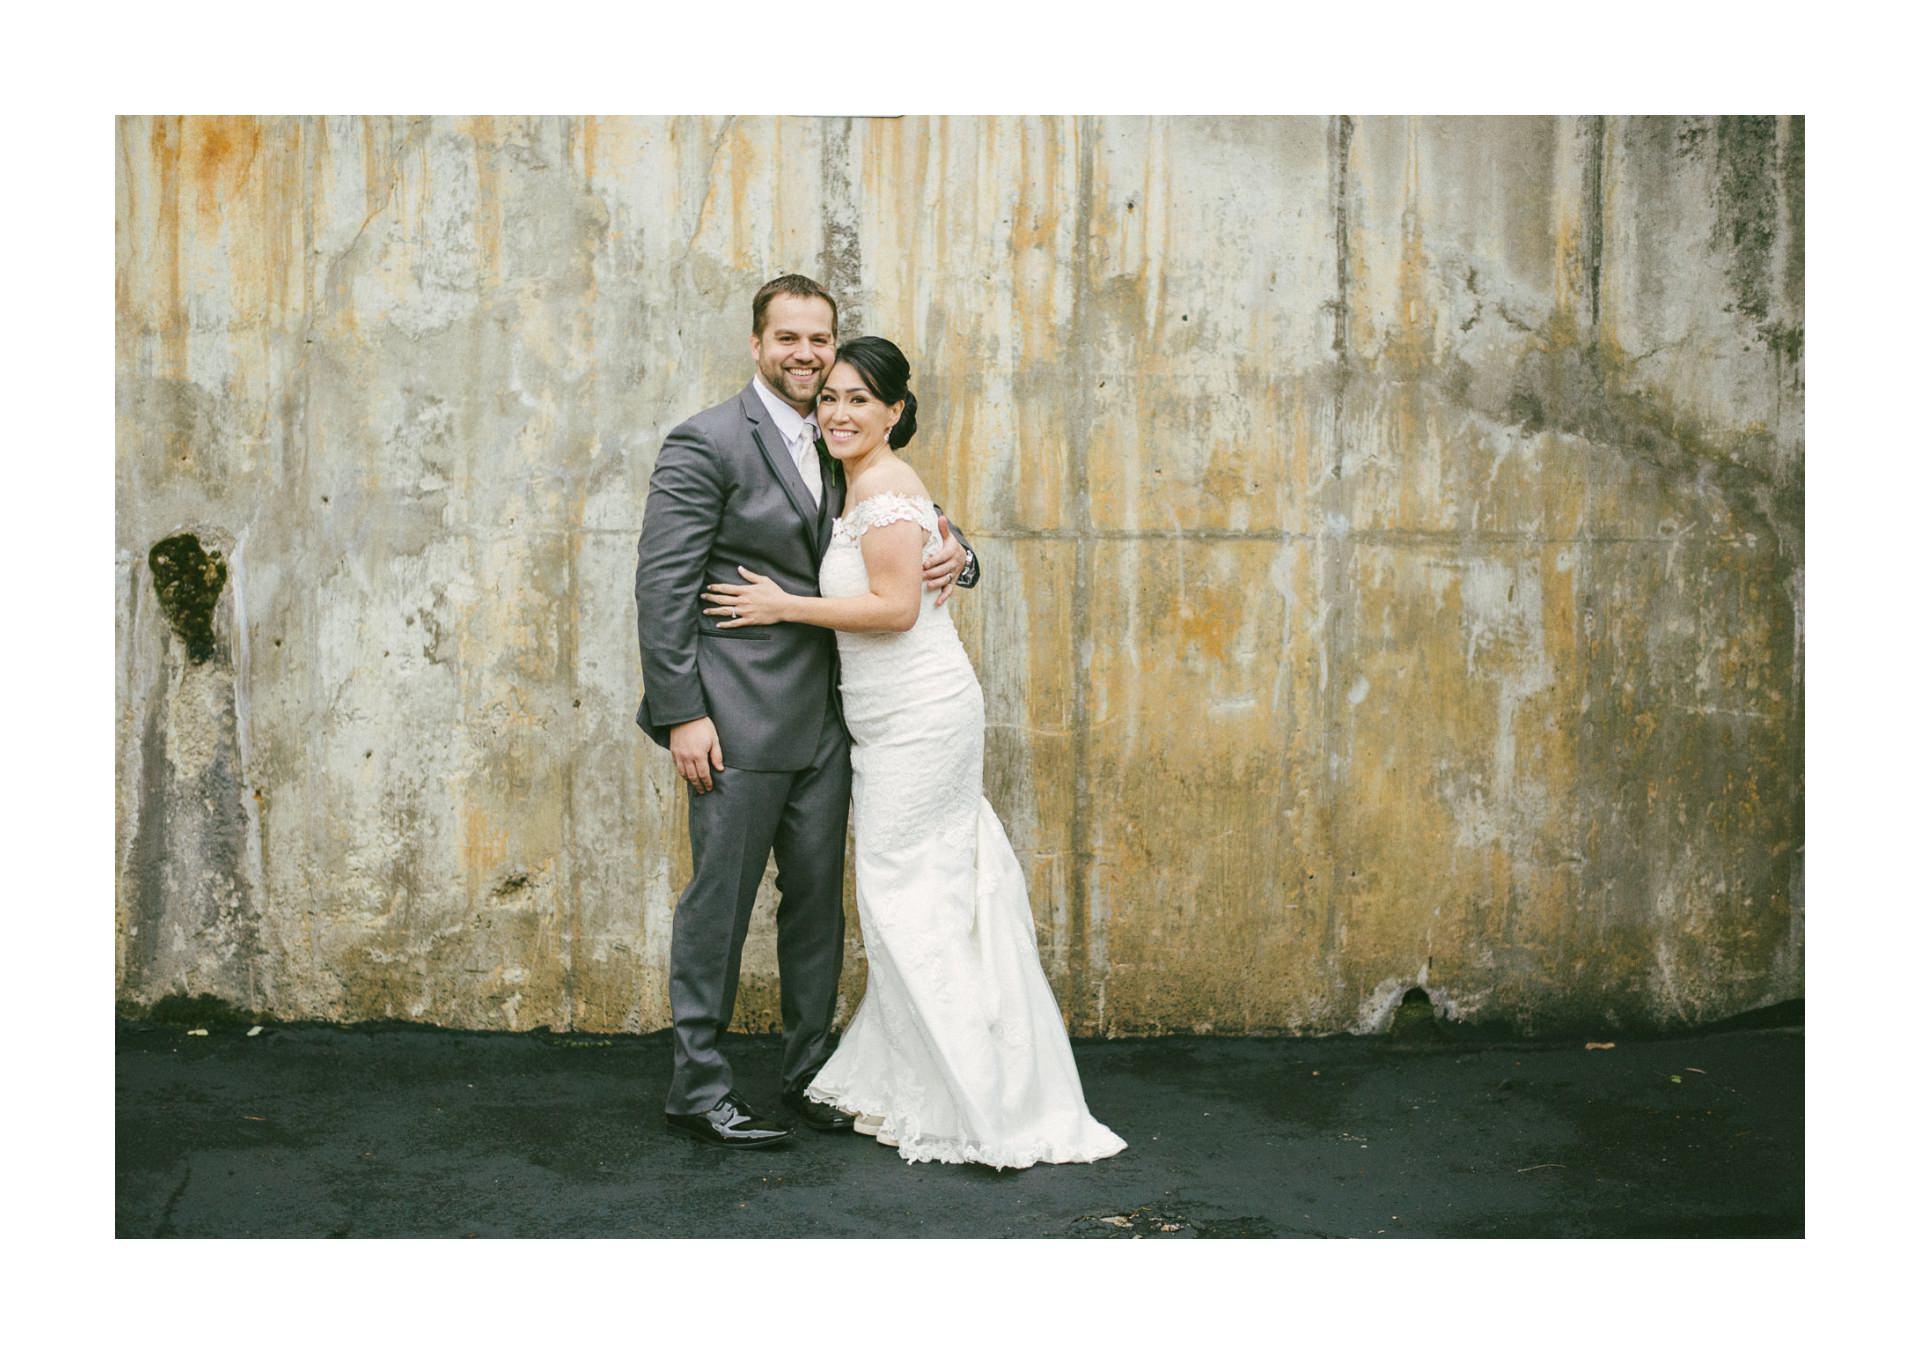 Patterson Fruit Farm Wedding Photographer in Cleveland 1 41.jpg